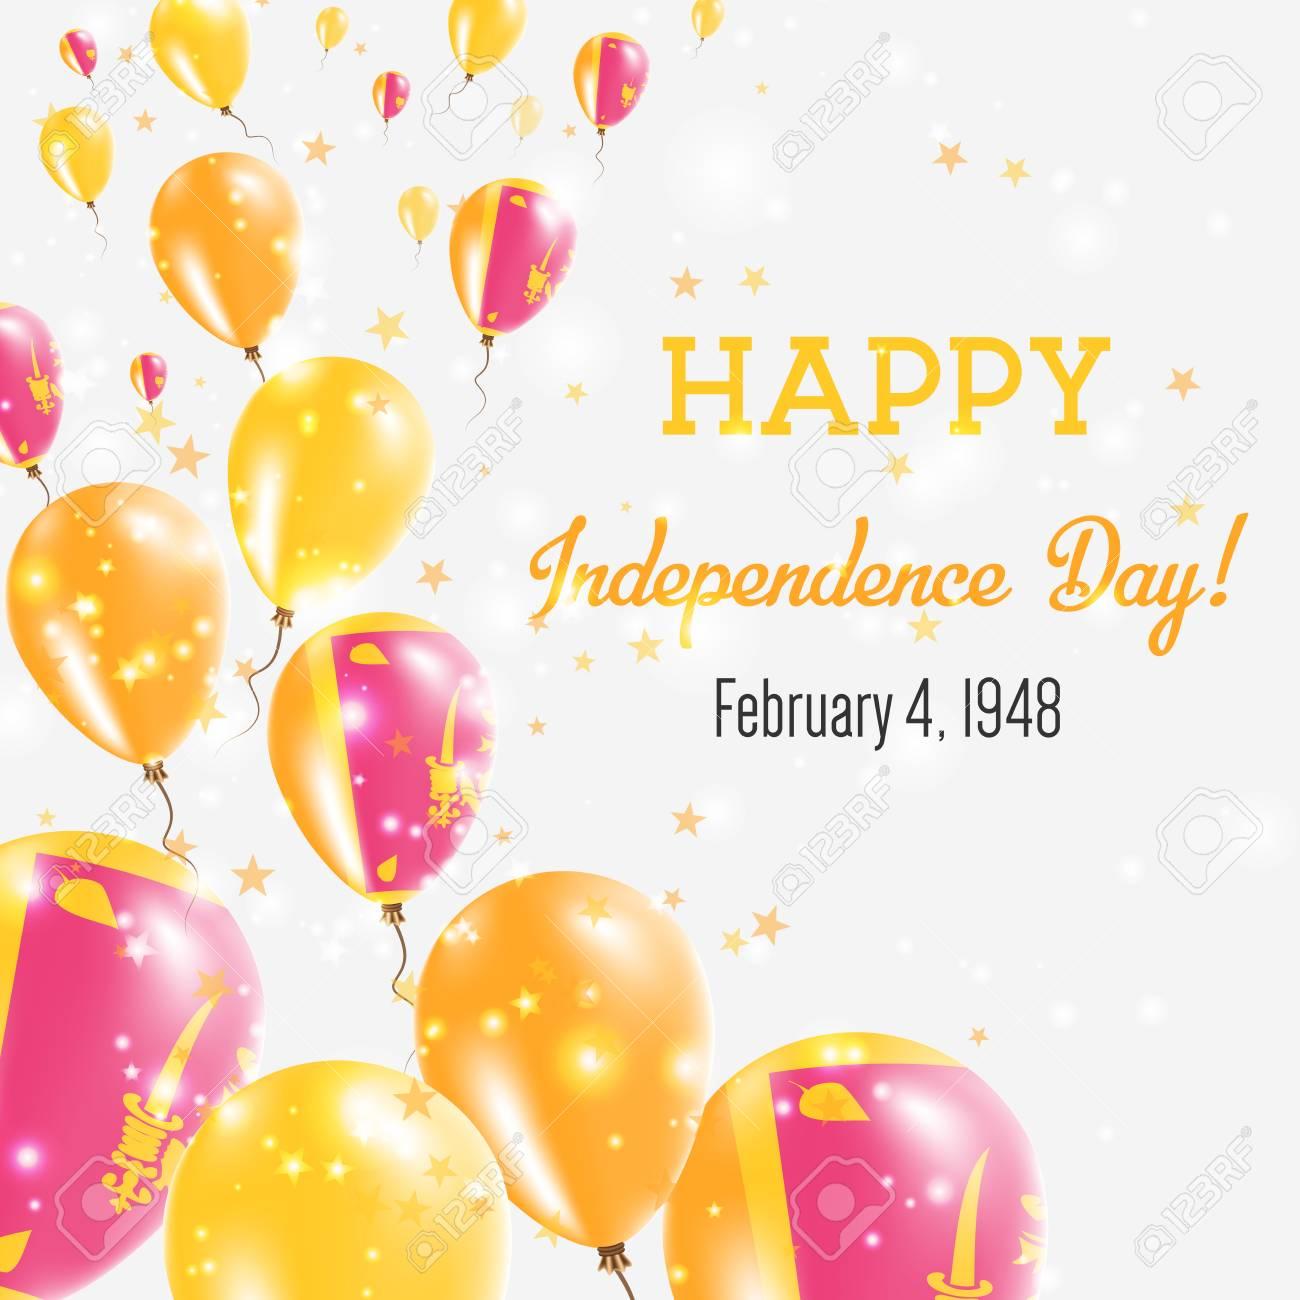 Sri lanka independence day greeting card flying balloons in sri lanka independence day greeting card flying balloons in sri lanka national colors happy m4hsunfo